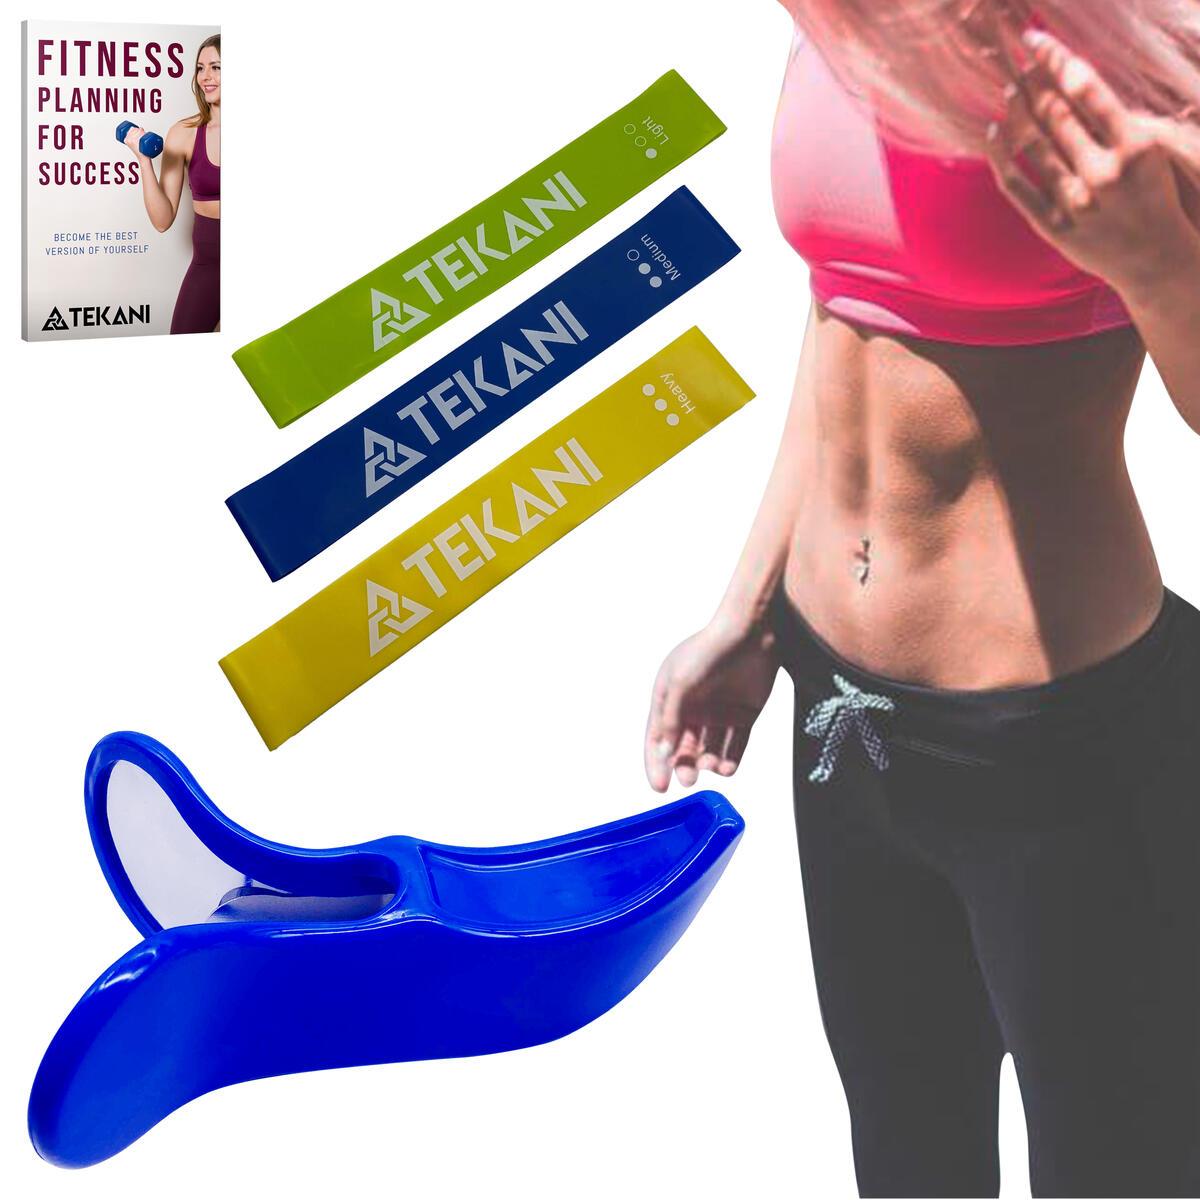 [UPGRADED-2020] Premium Hip Trainer Kegel Exerciser Pelgrip Pelvis Floor Muscle & Inner Thigh Exerciser for Buttocks - Pelvic Postpartum Rehabilitation - Resistance Bands & eBook Included